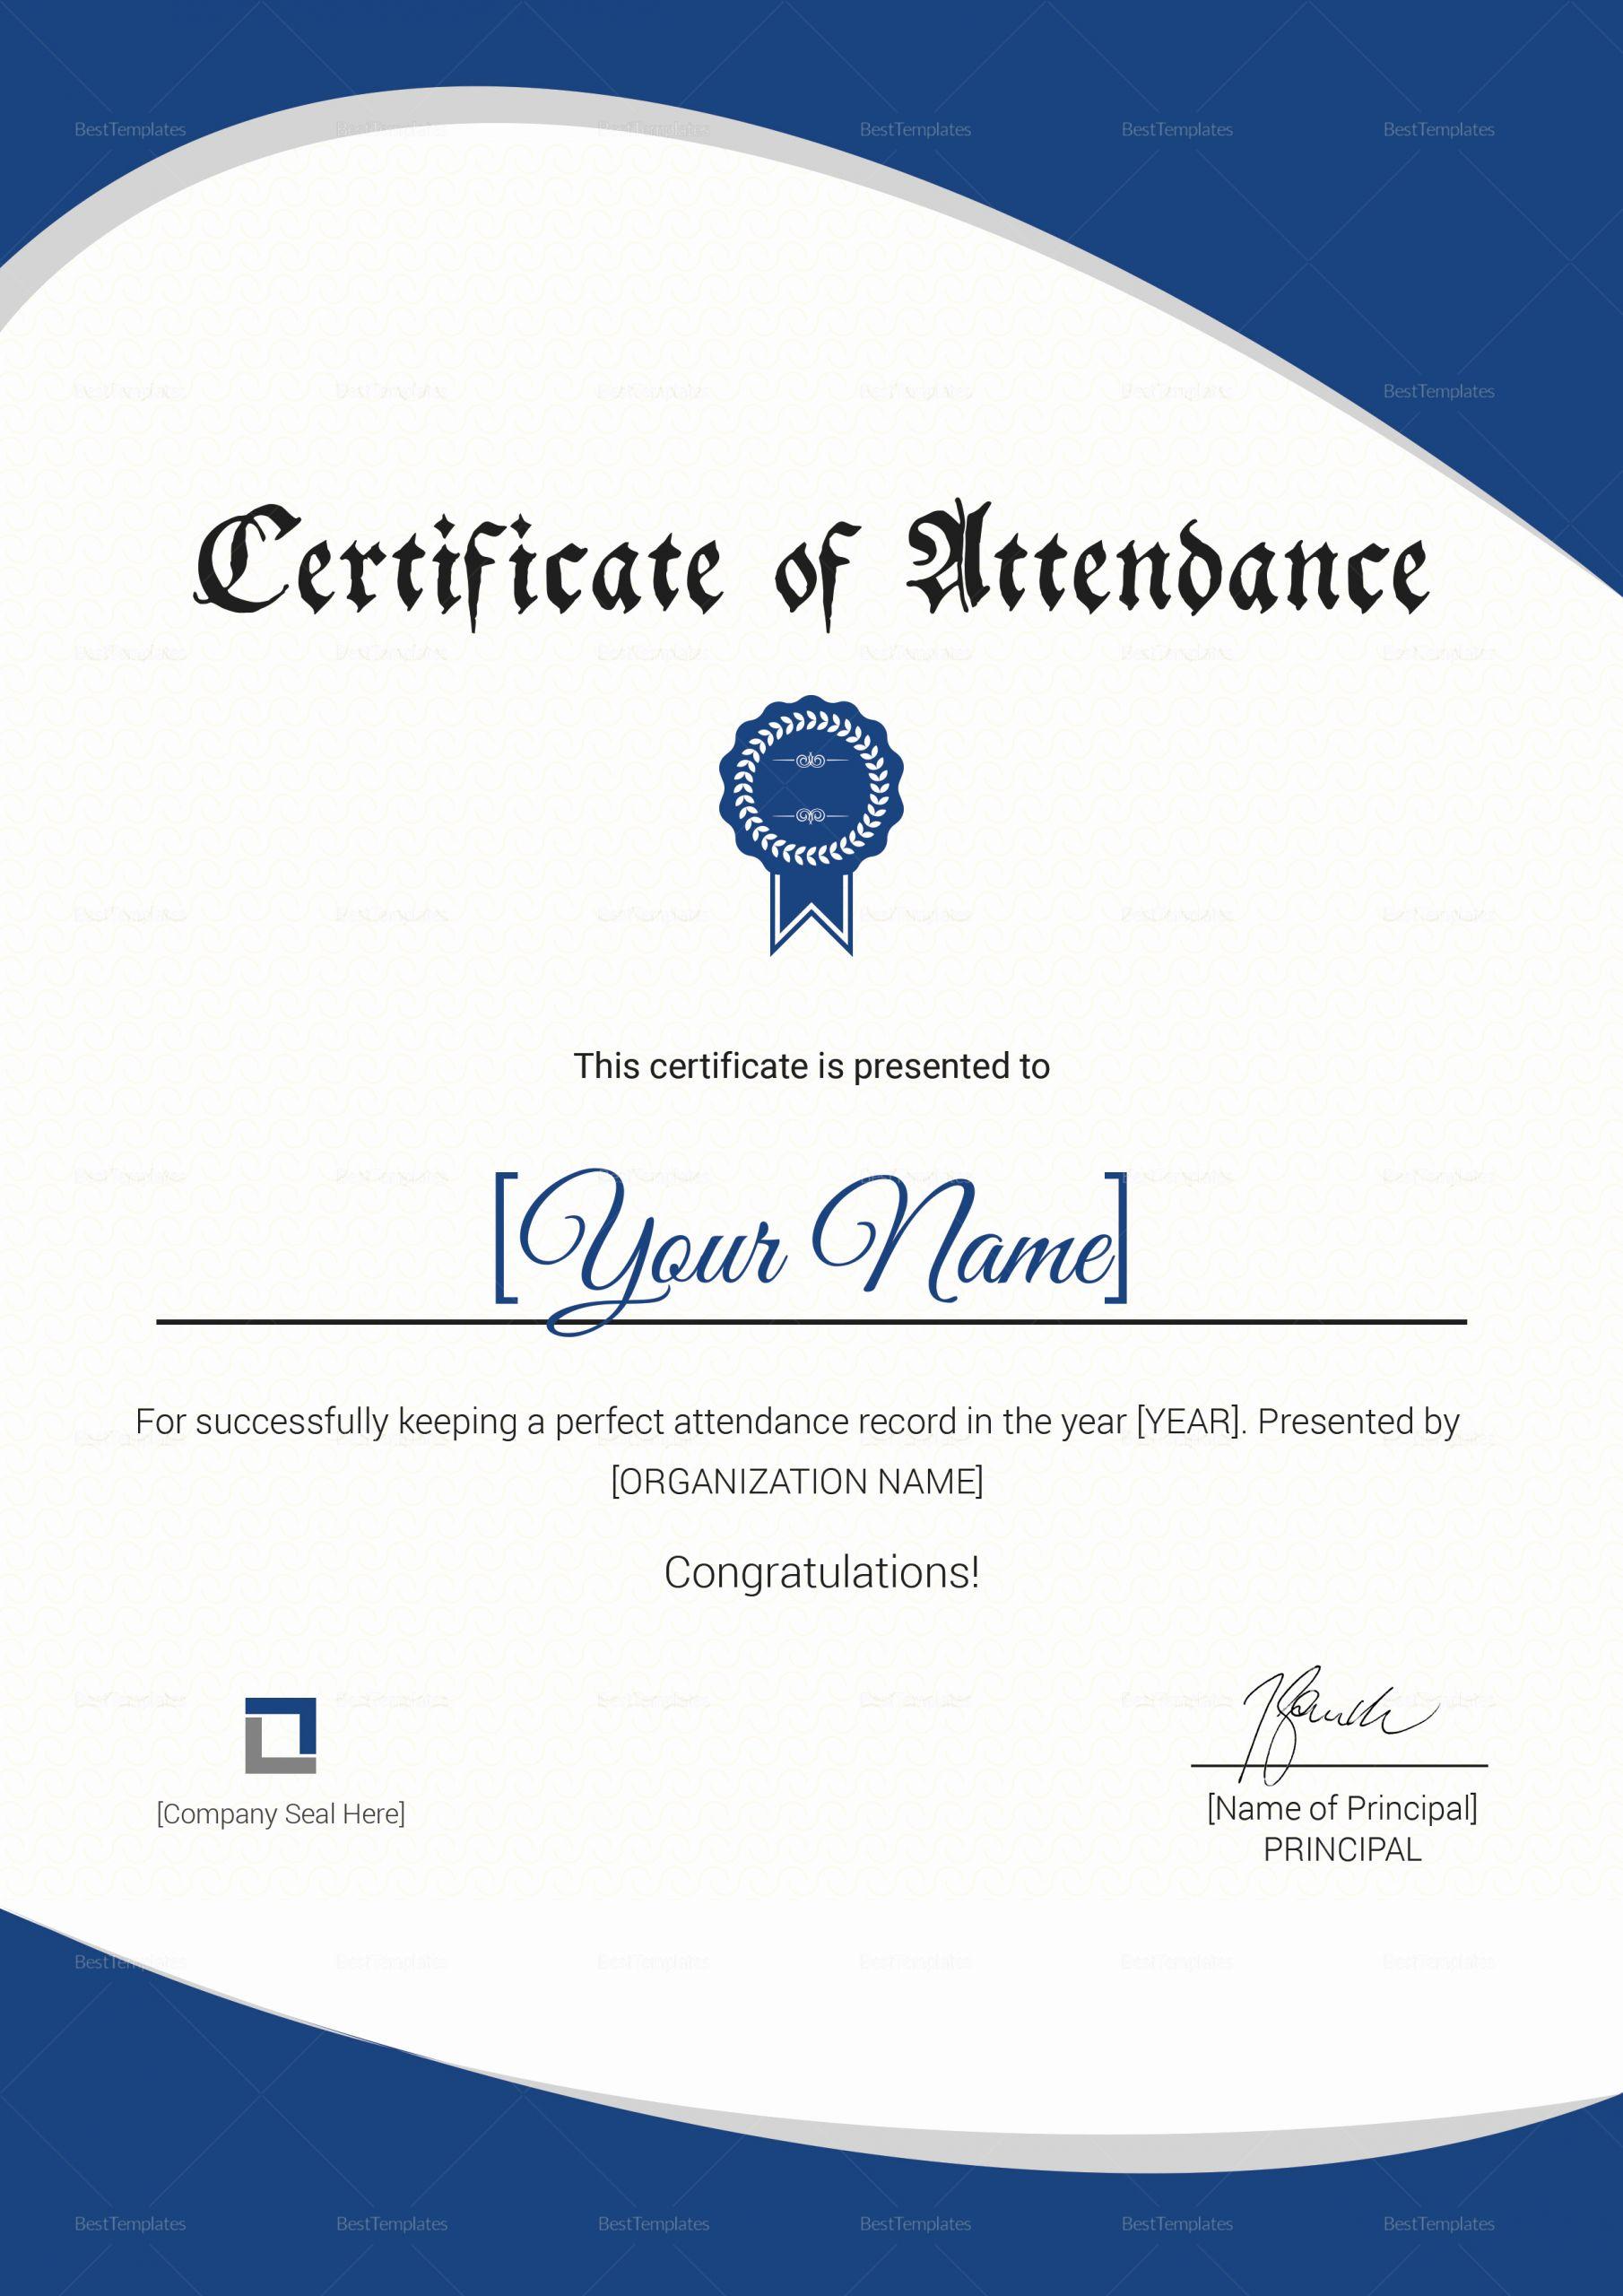 Certificate Of attendance Template Free Best Of attendance Certificate Design Template In Psd Word